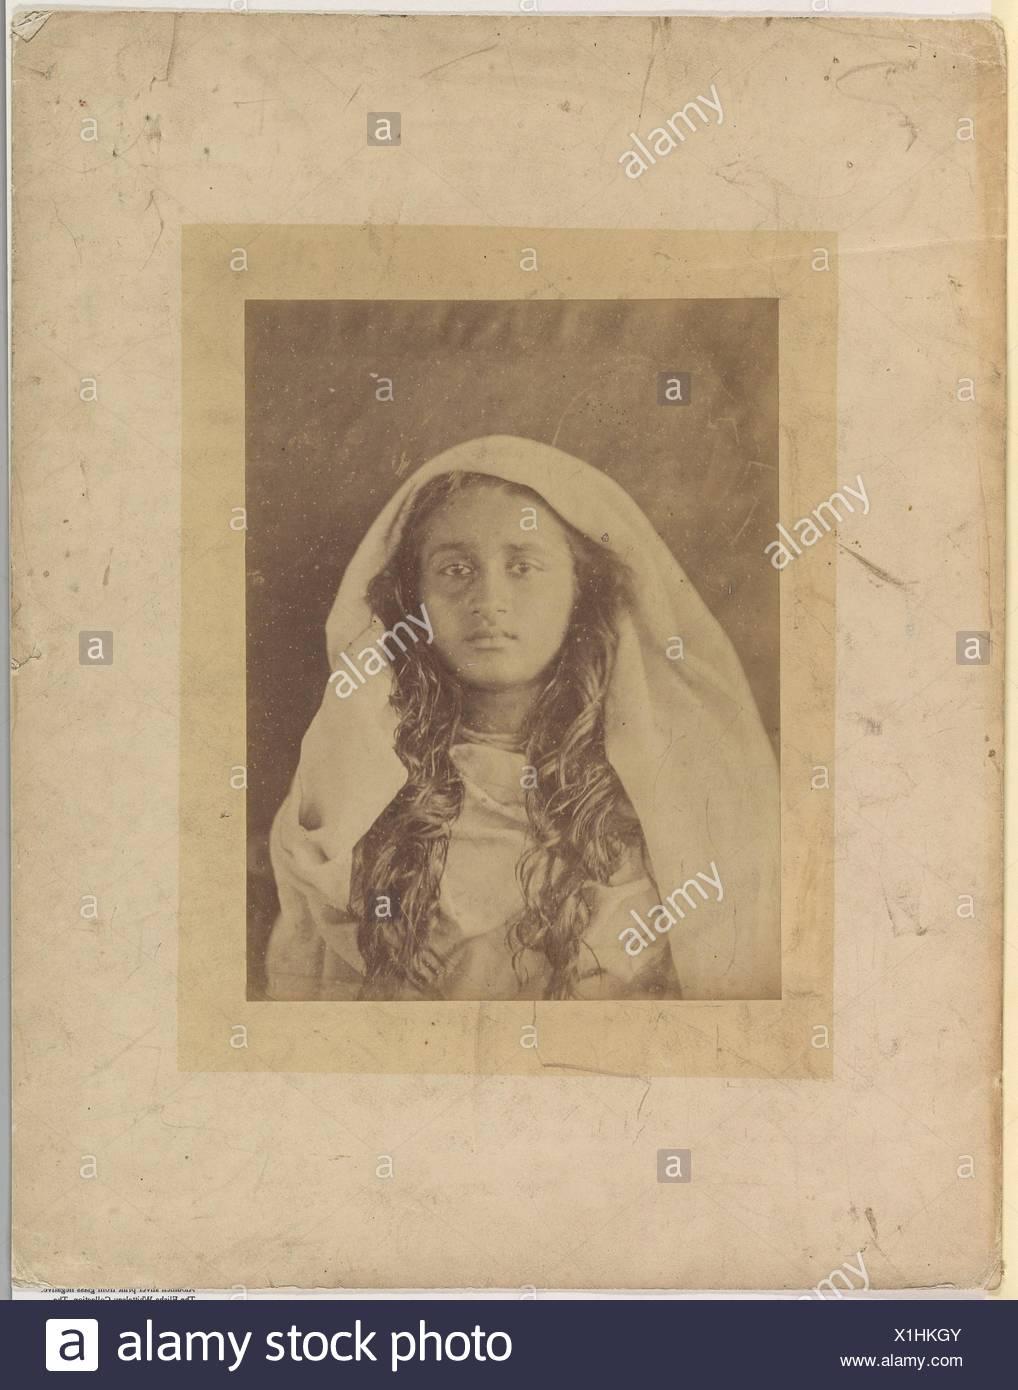 Ceylonese Woman. Artist: Julia Margaret Cameron (British (born India), Calcutta 1815-1879 Kalutara, Ceylon); Date: 1875-79; Medium: Albumen silver Stock Photo